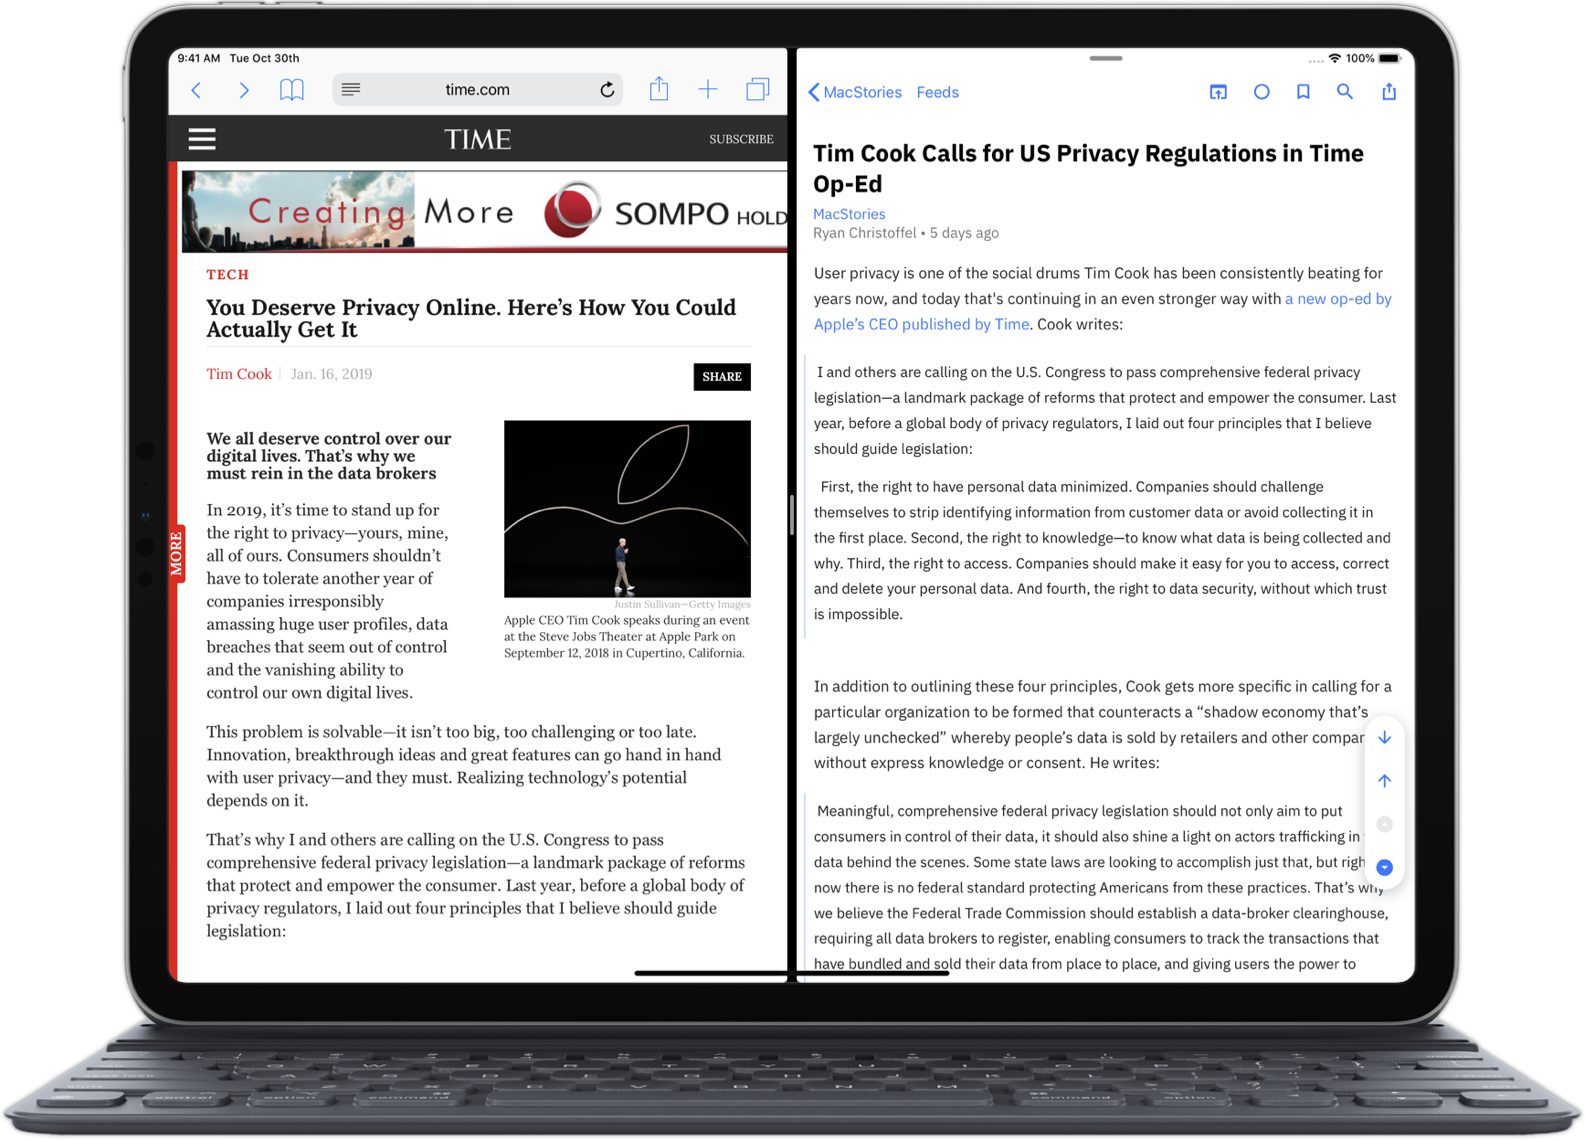 Elytra's Article Reader Interface